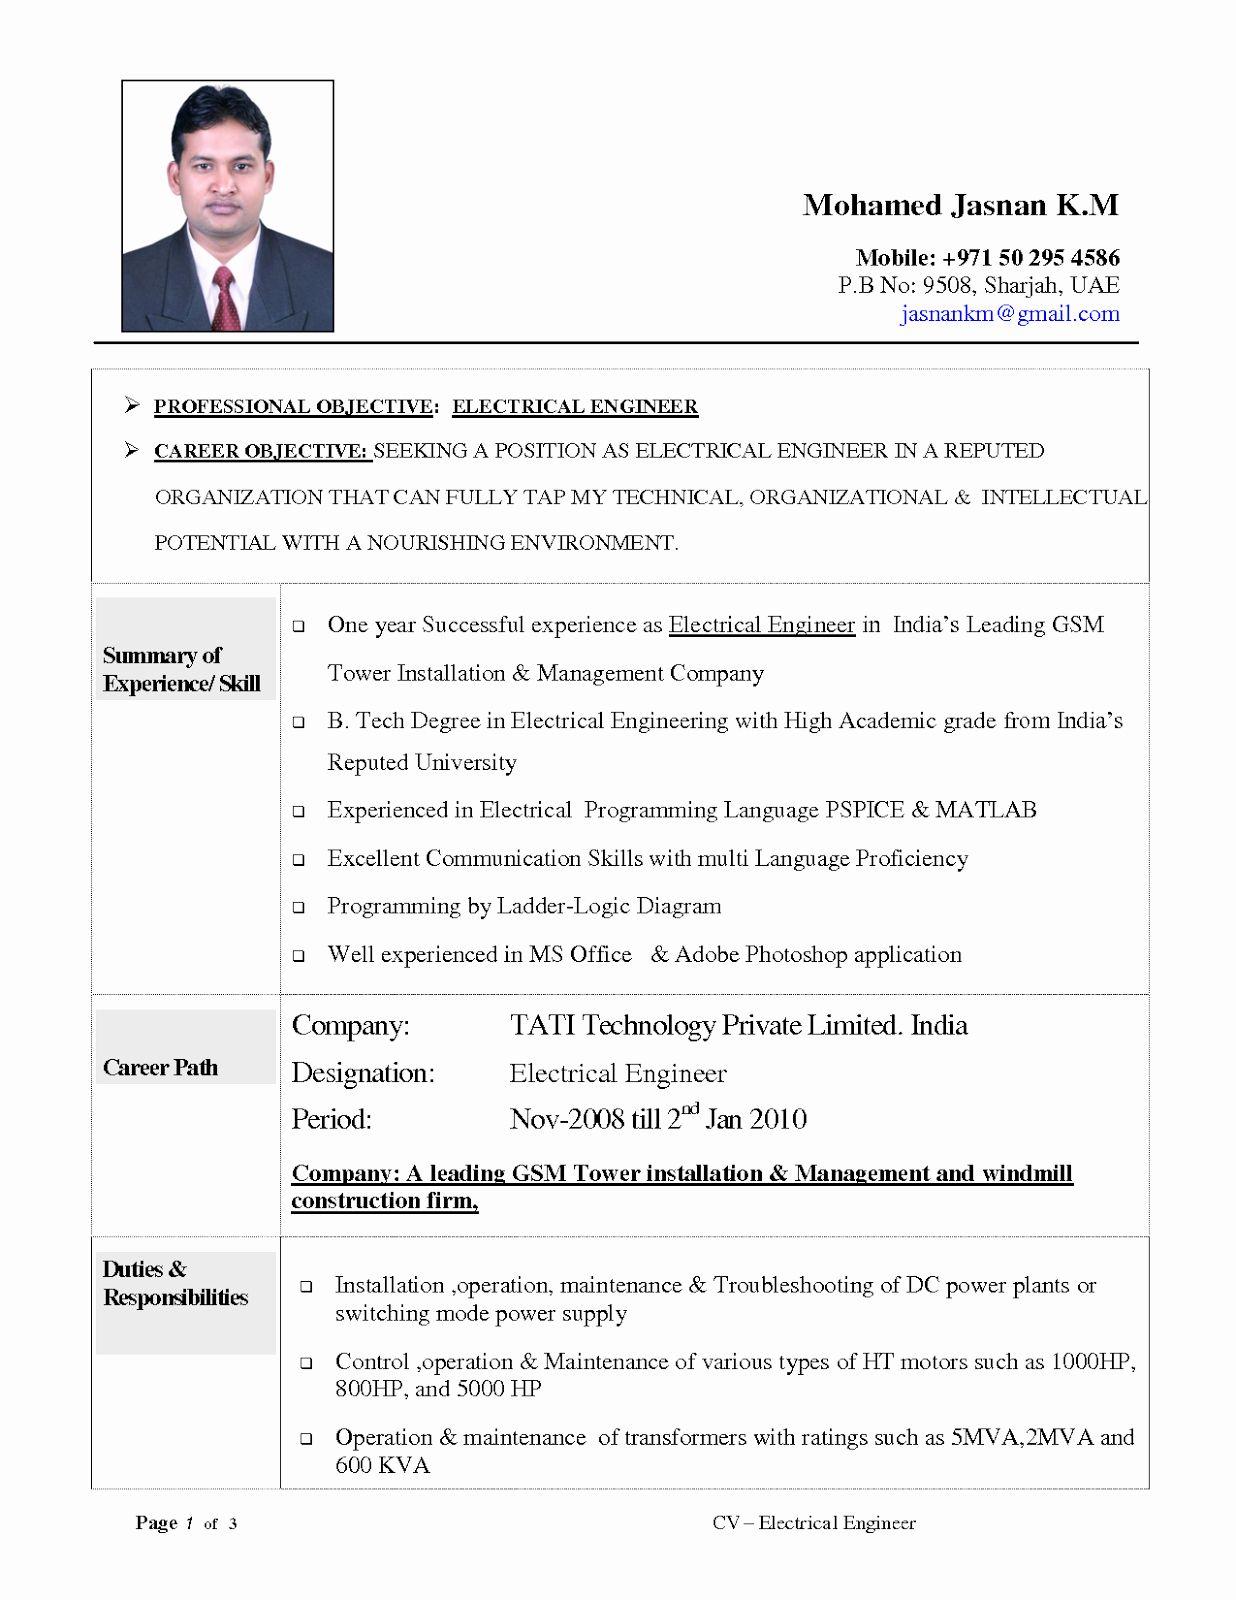 Electrical Engineer Resume Sample Beautiful Resume Objective Examples Electrical Engineering Tipss Engineering Resume Resume Examples Job Resume Examples